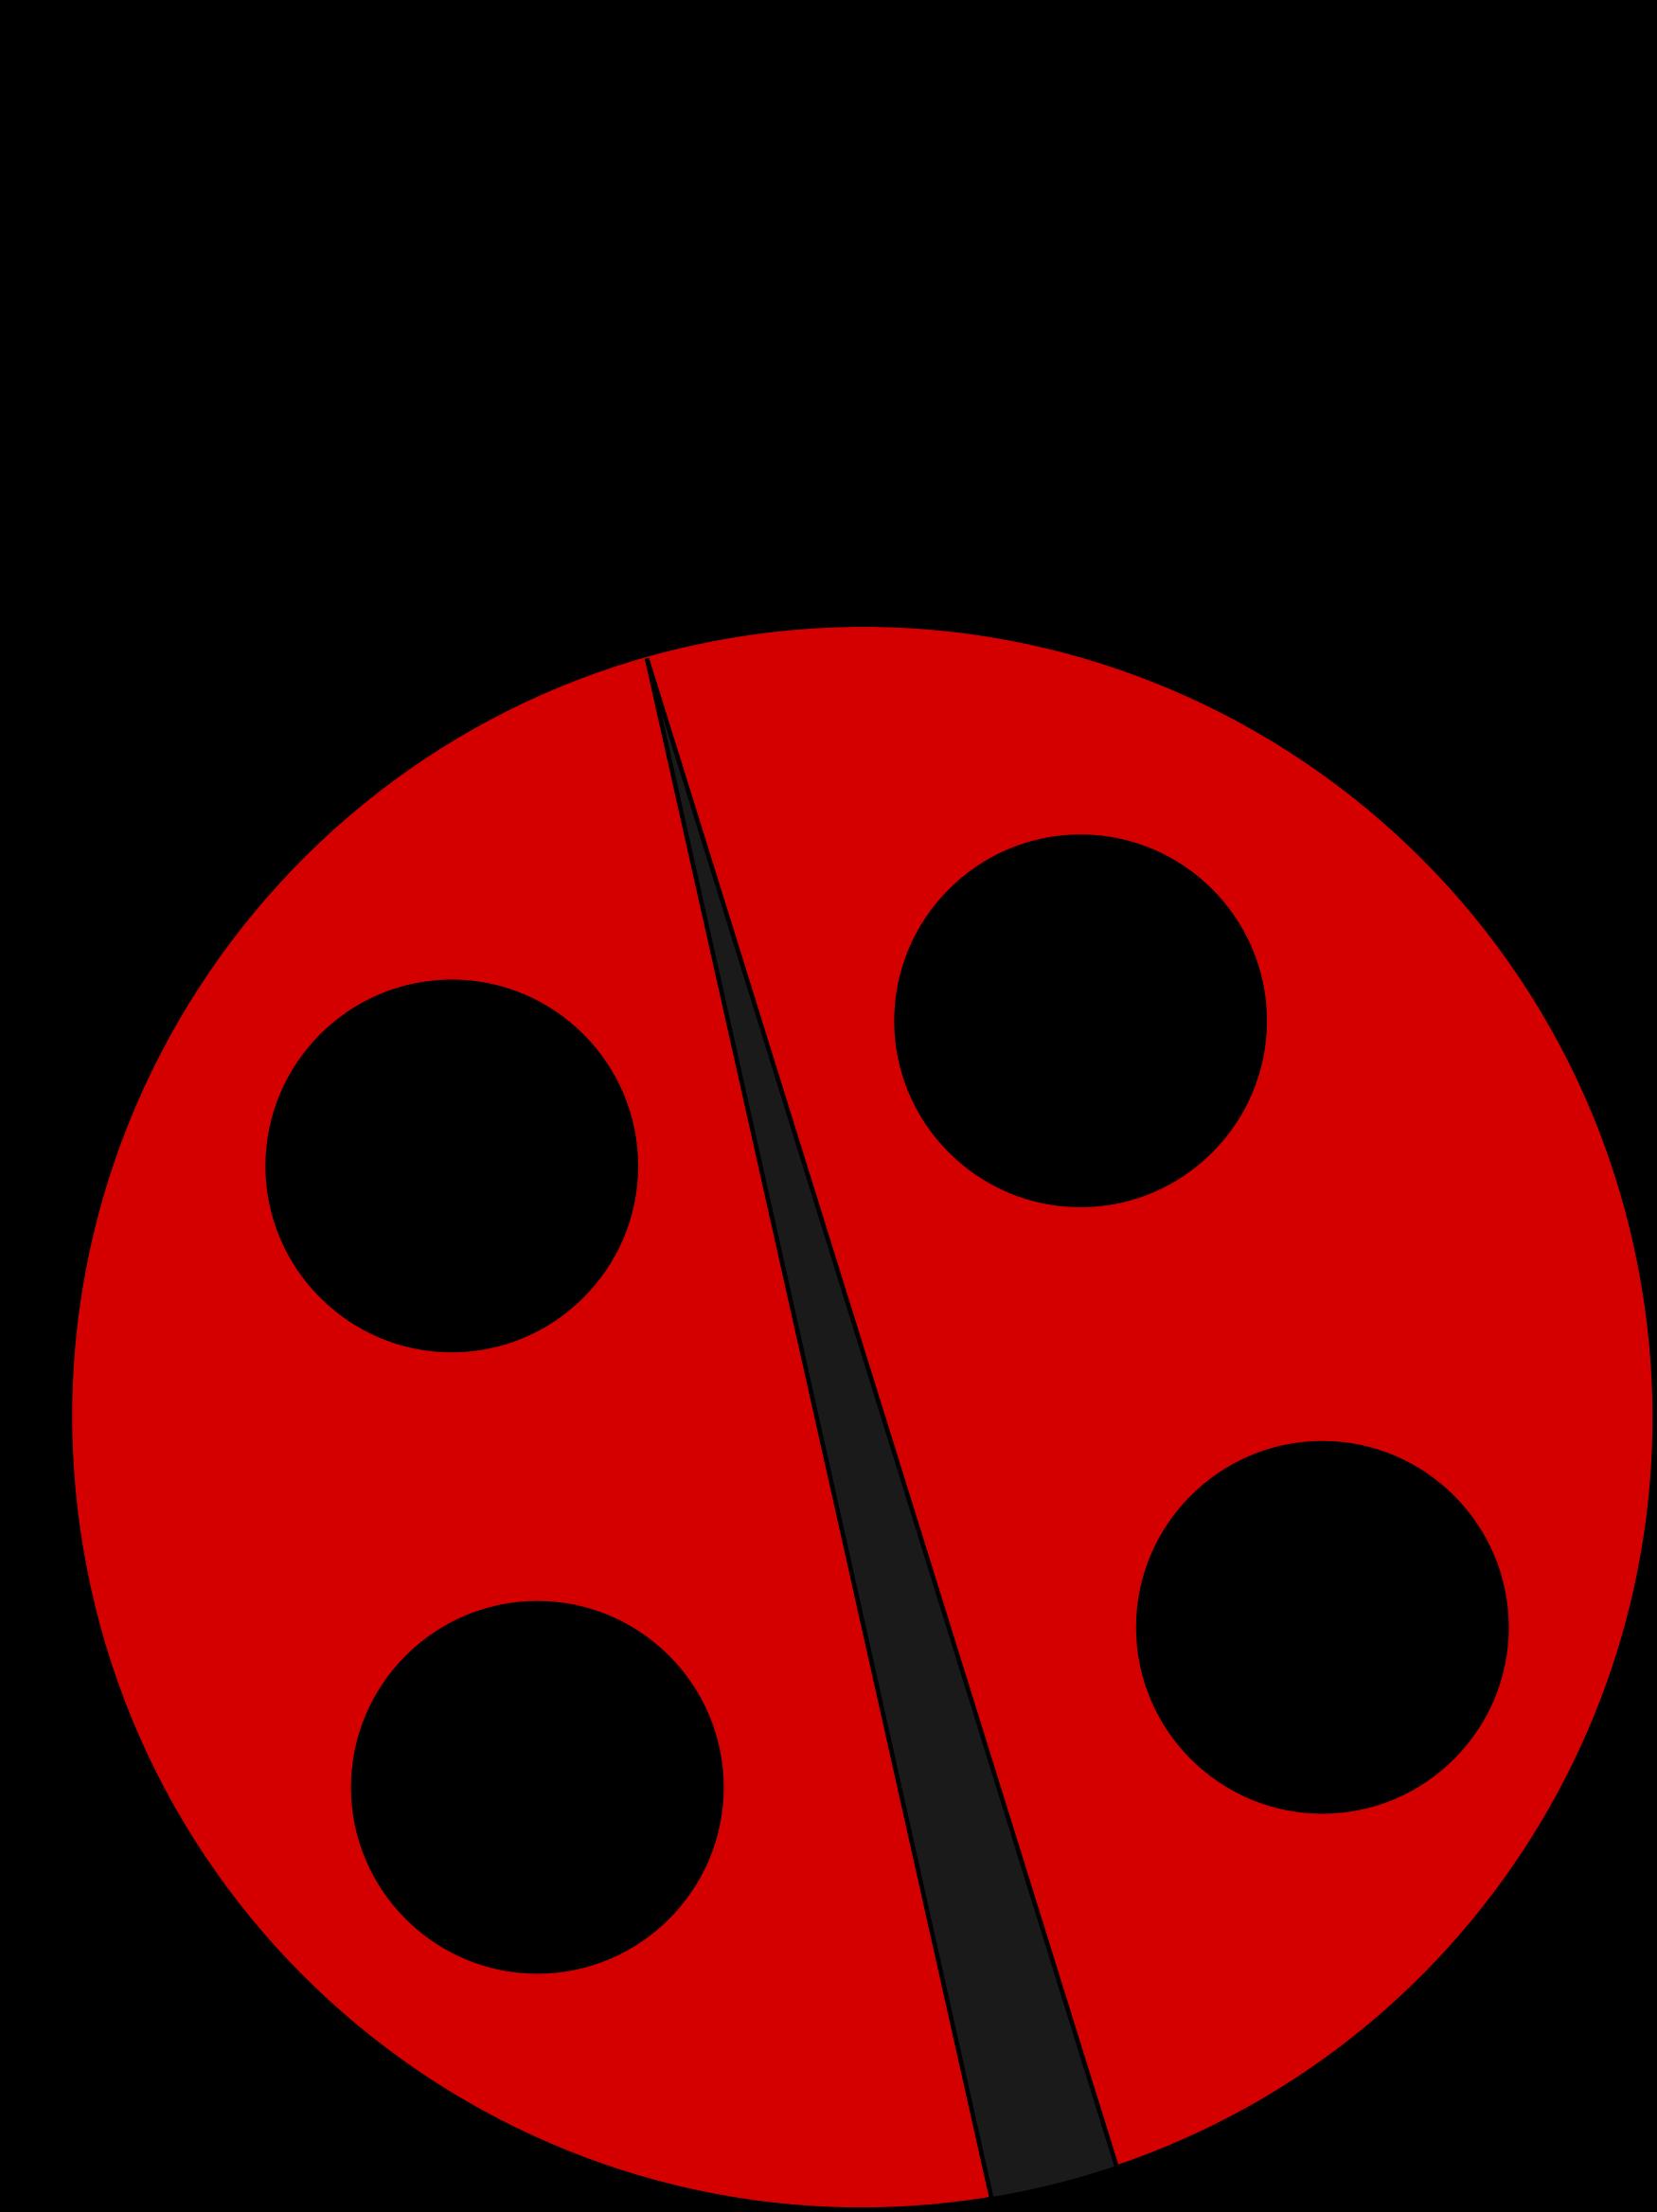 Ladybug Ladybug Cartoon Ladybug Crafts Ladybug